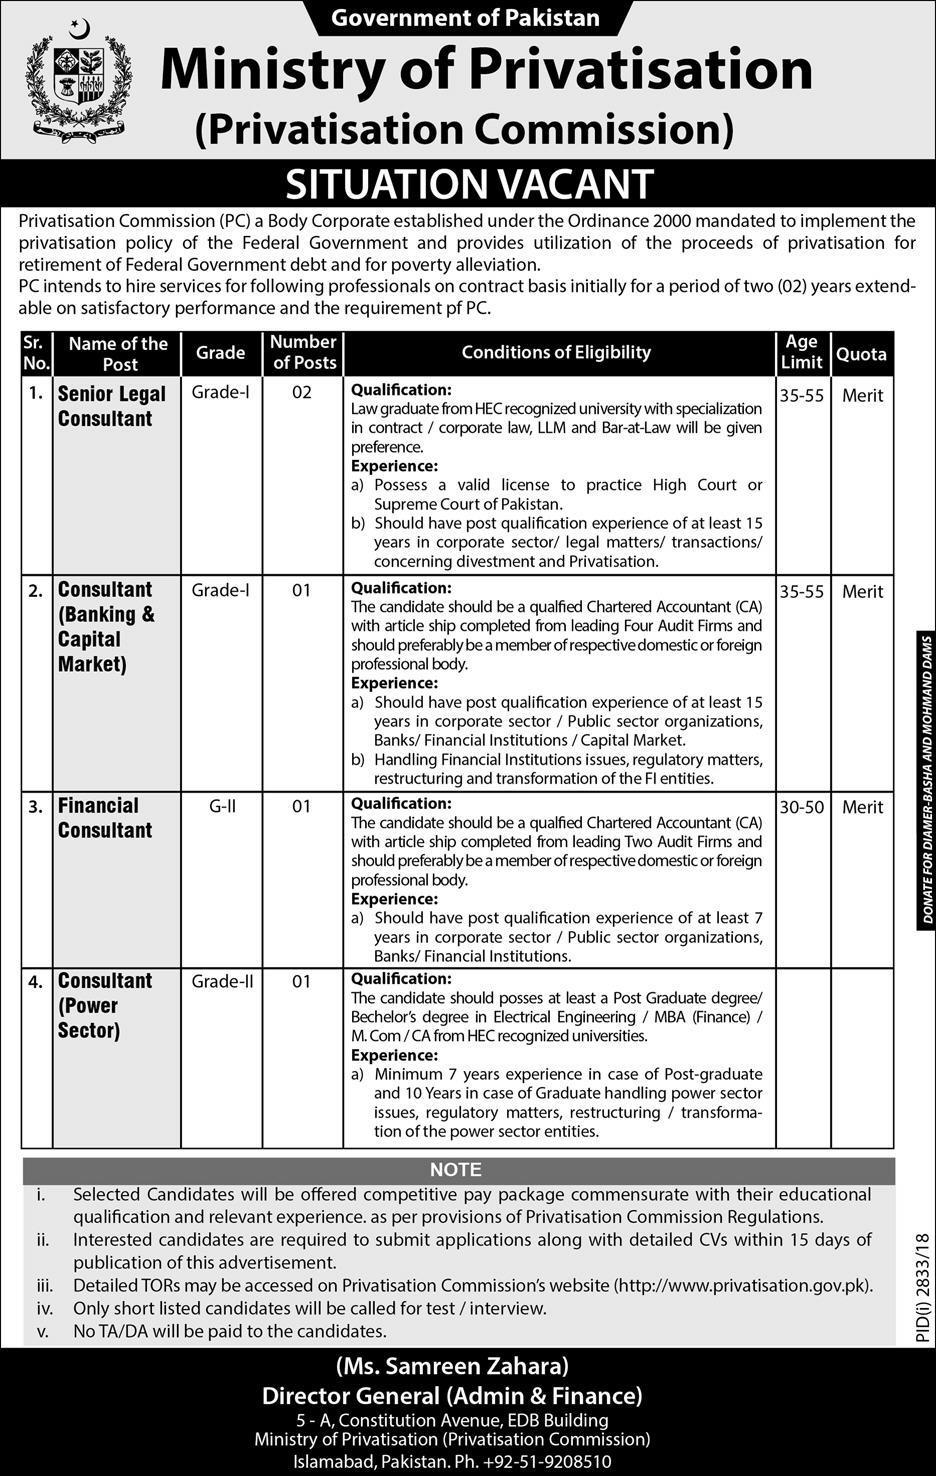 Ministry Of Privatisation Govt Of Pakistan 25 Dec 2018 Jobs